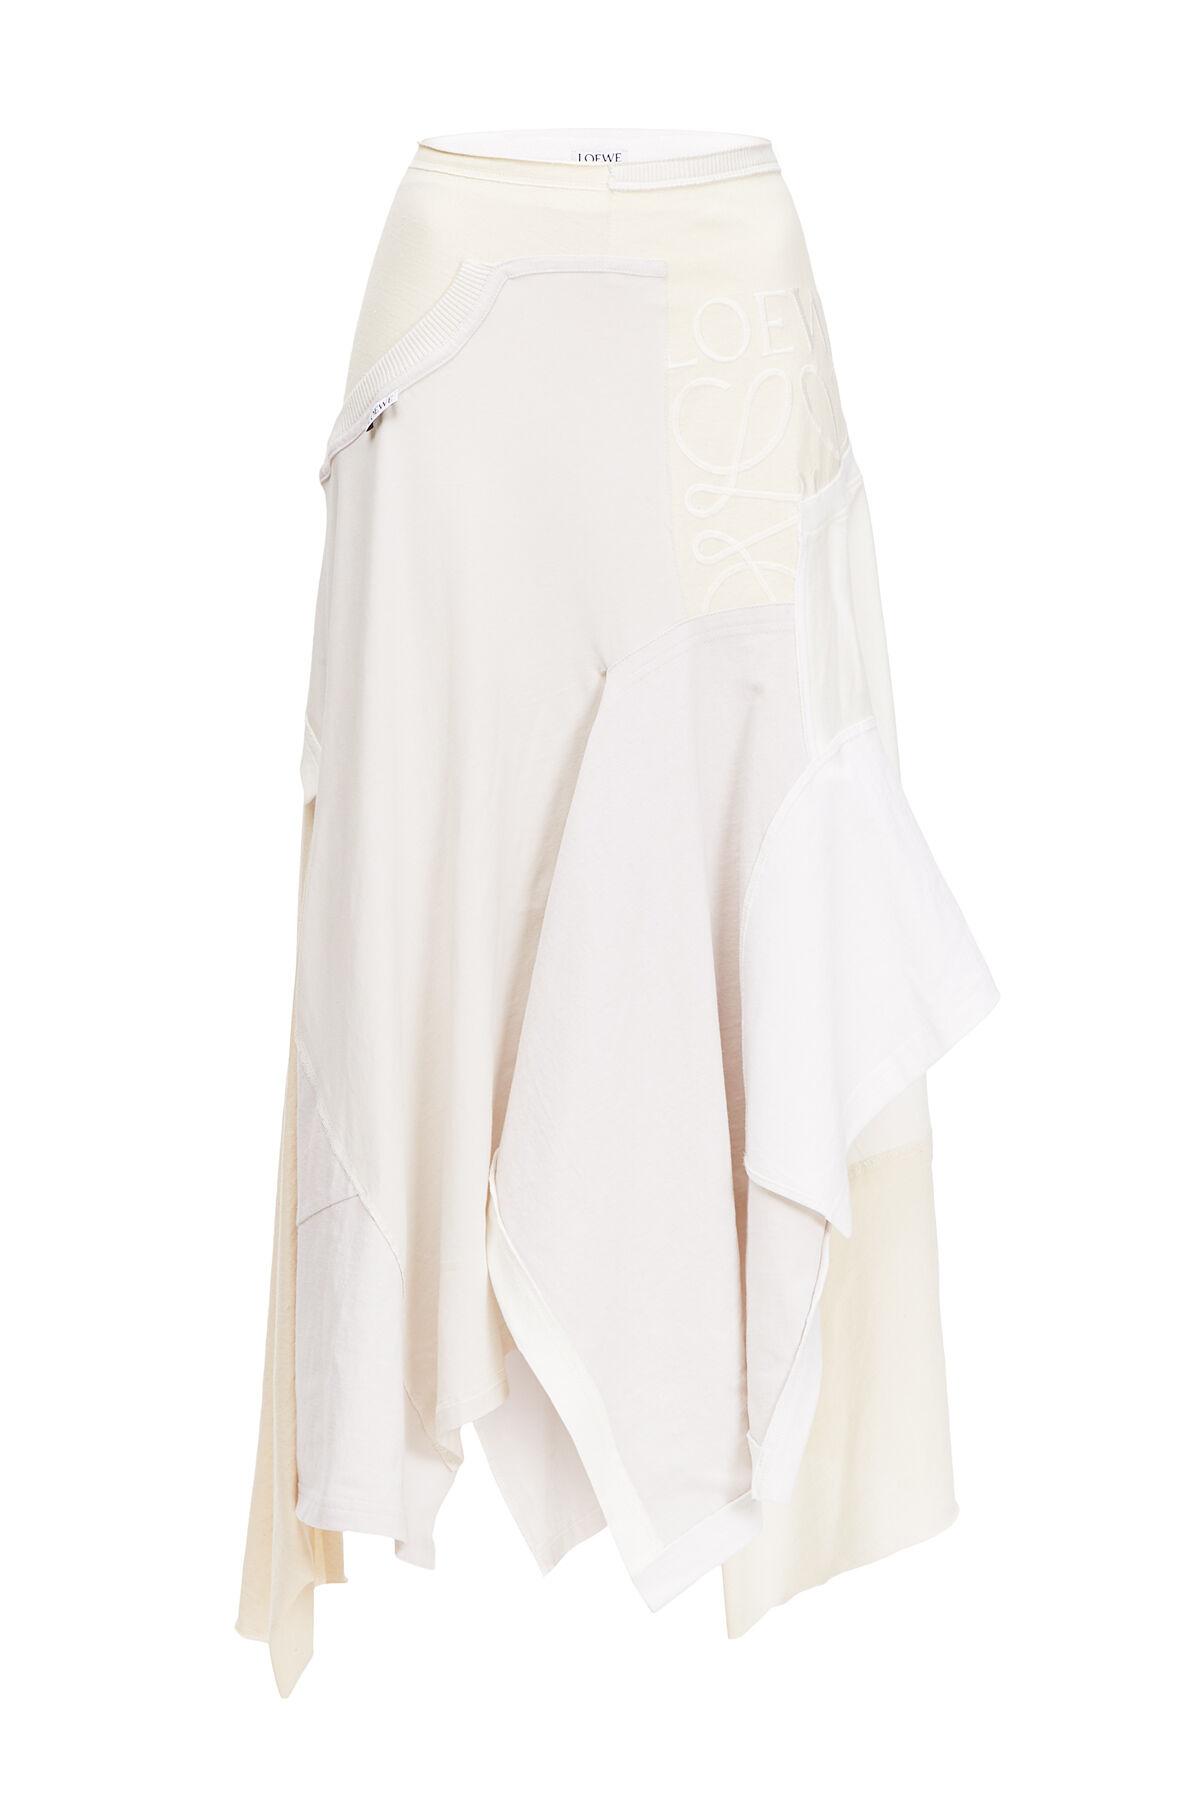 patchwork T-shirt - White Loewe 2018 Cool oYap0OA